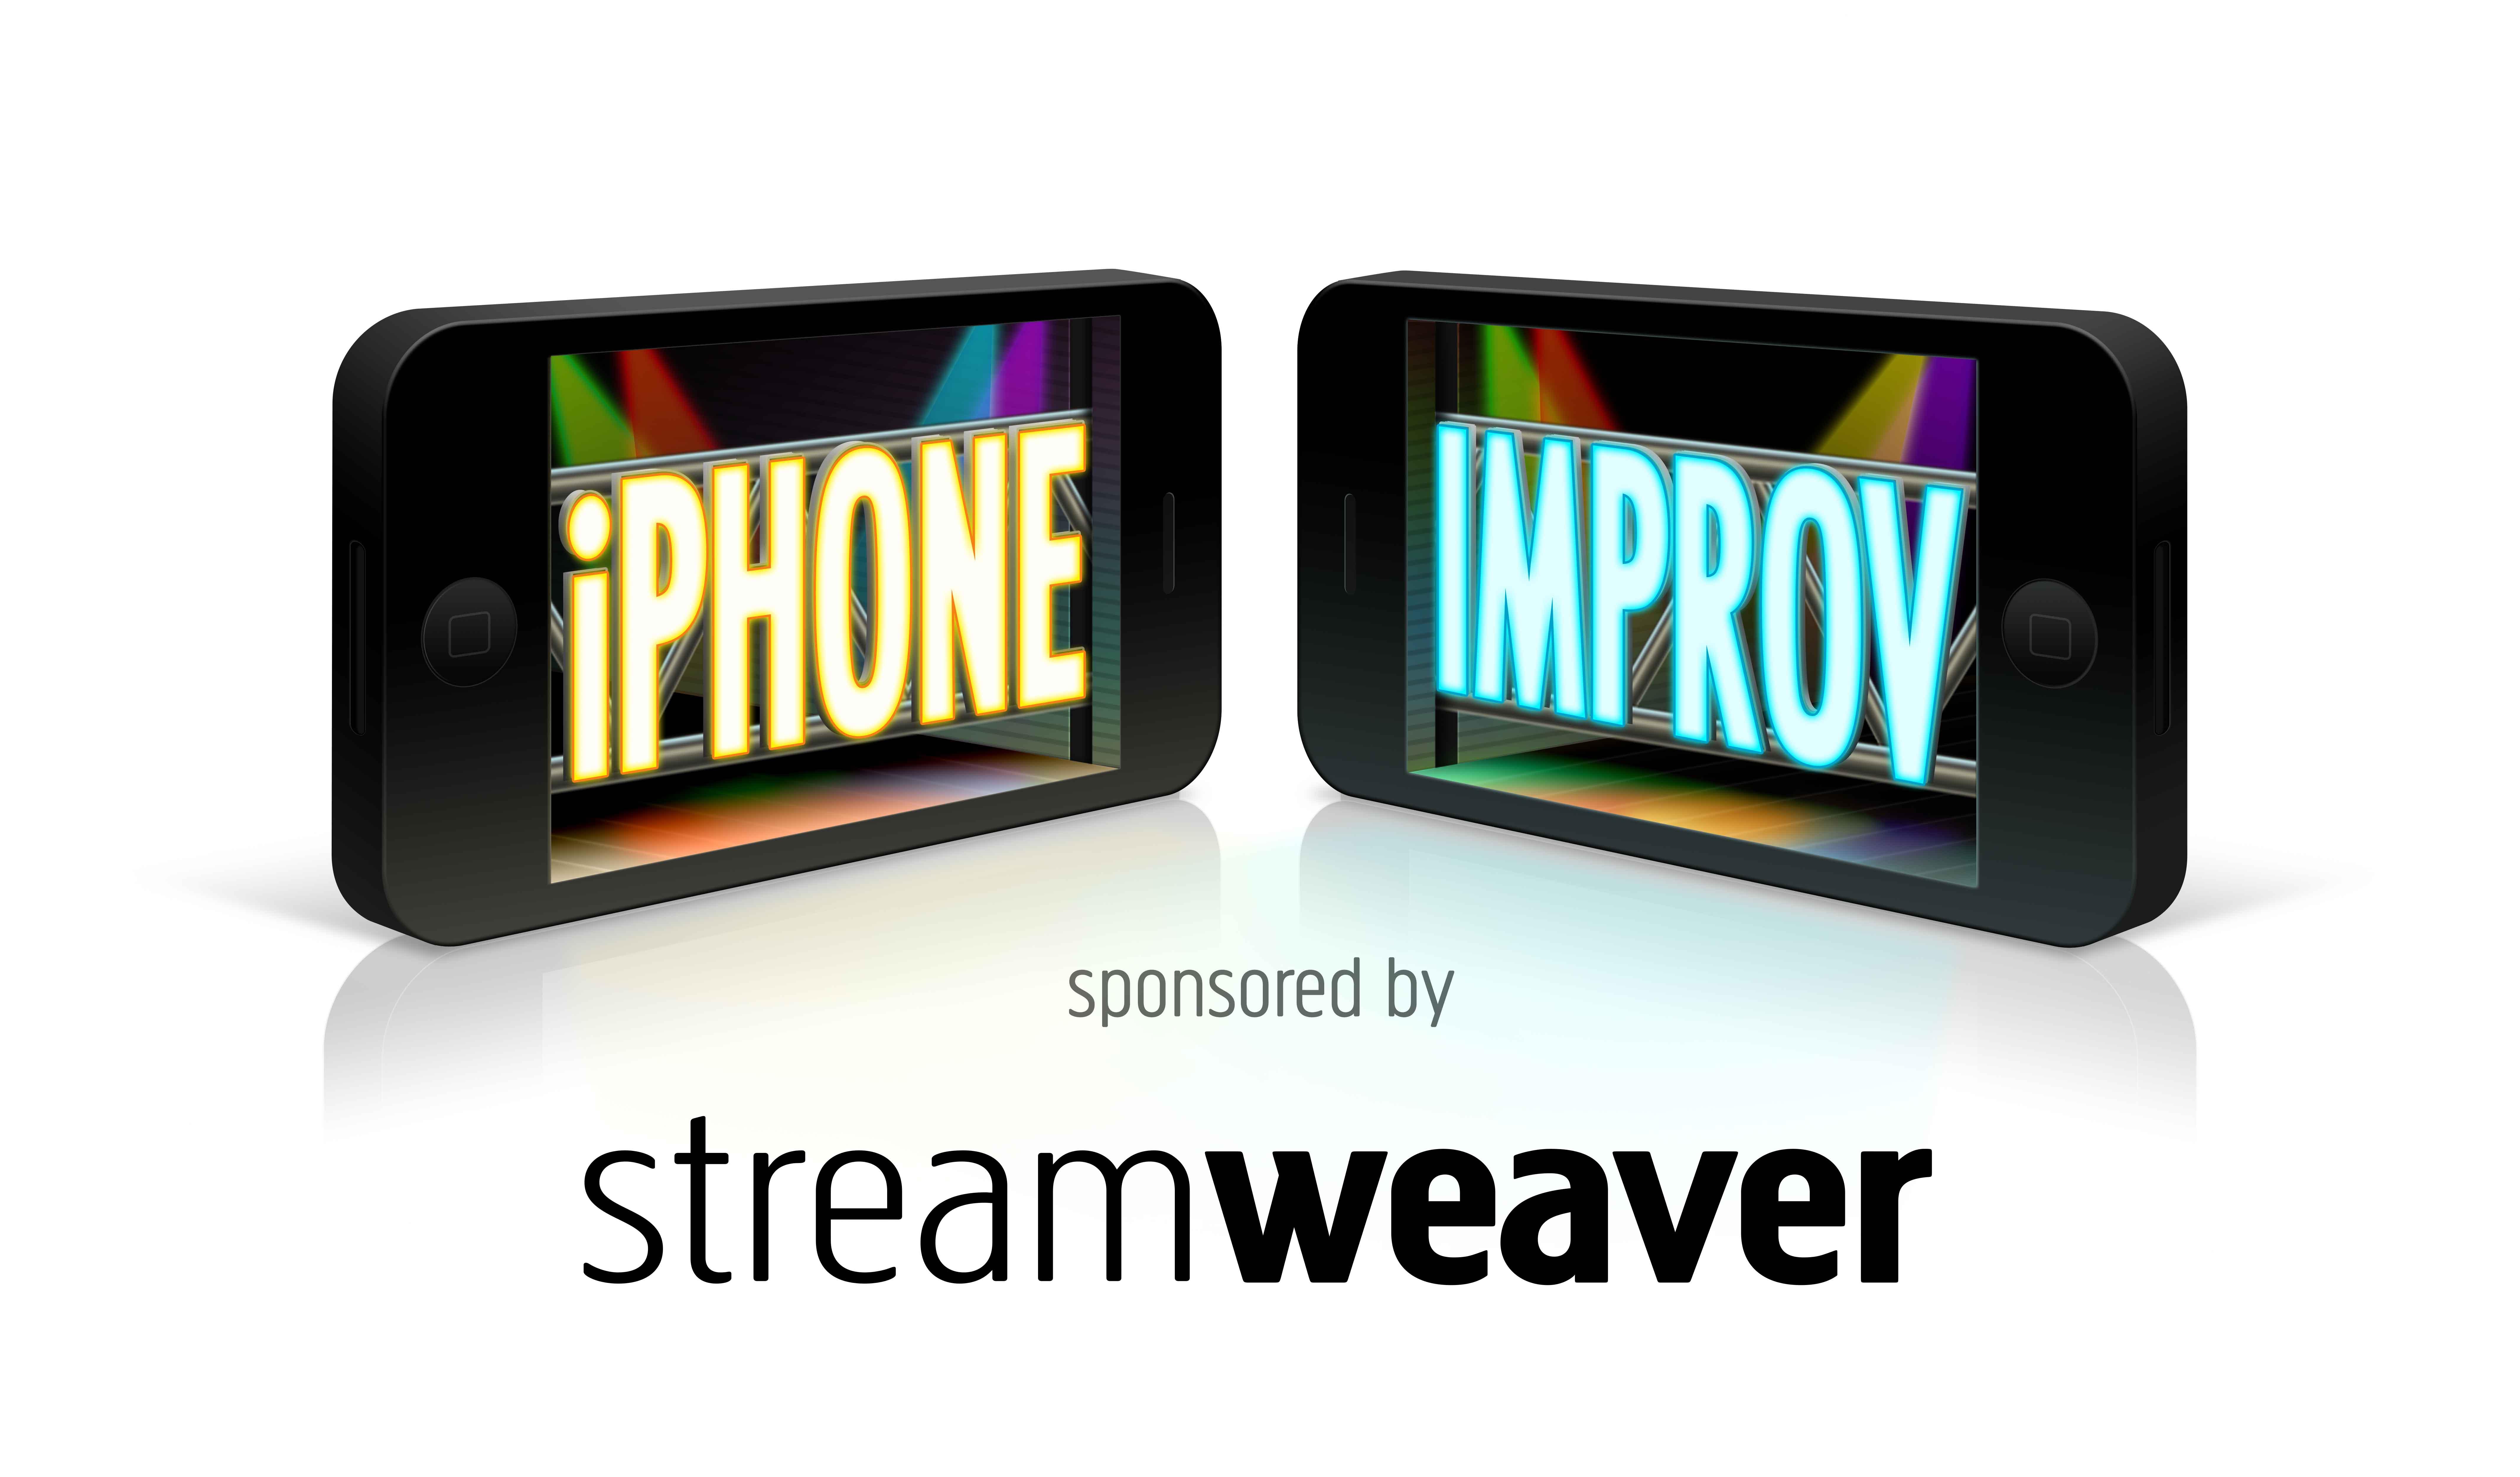 Streamweaver iphone improv contest